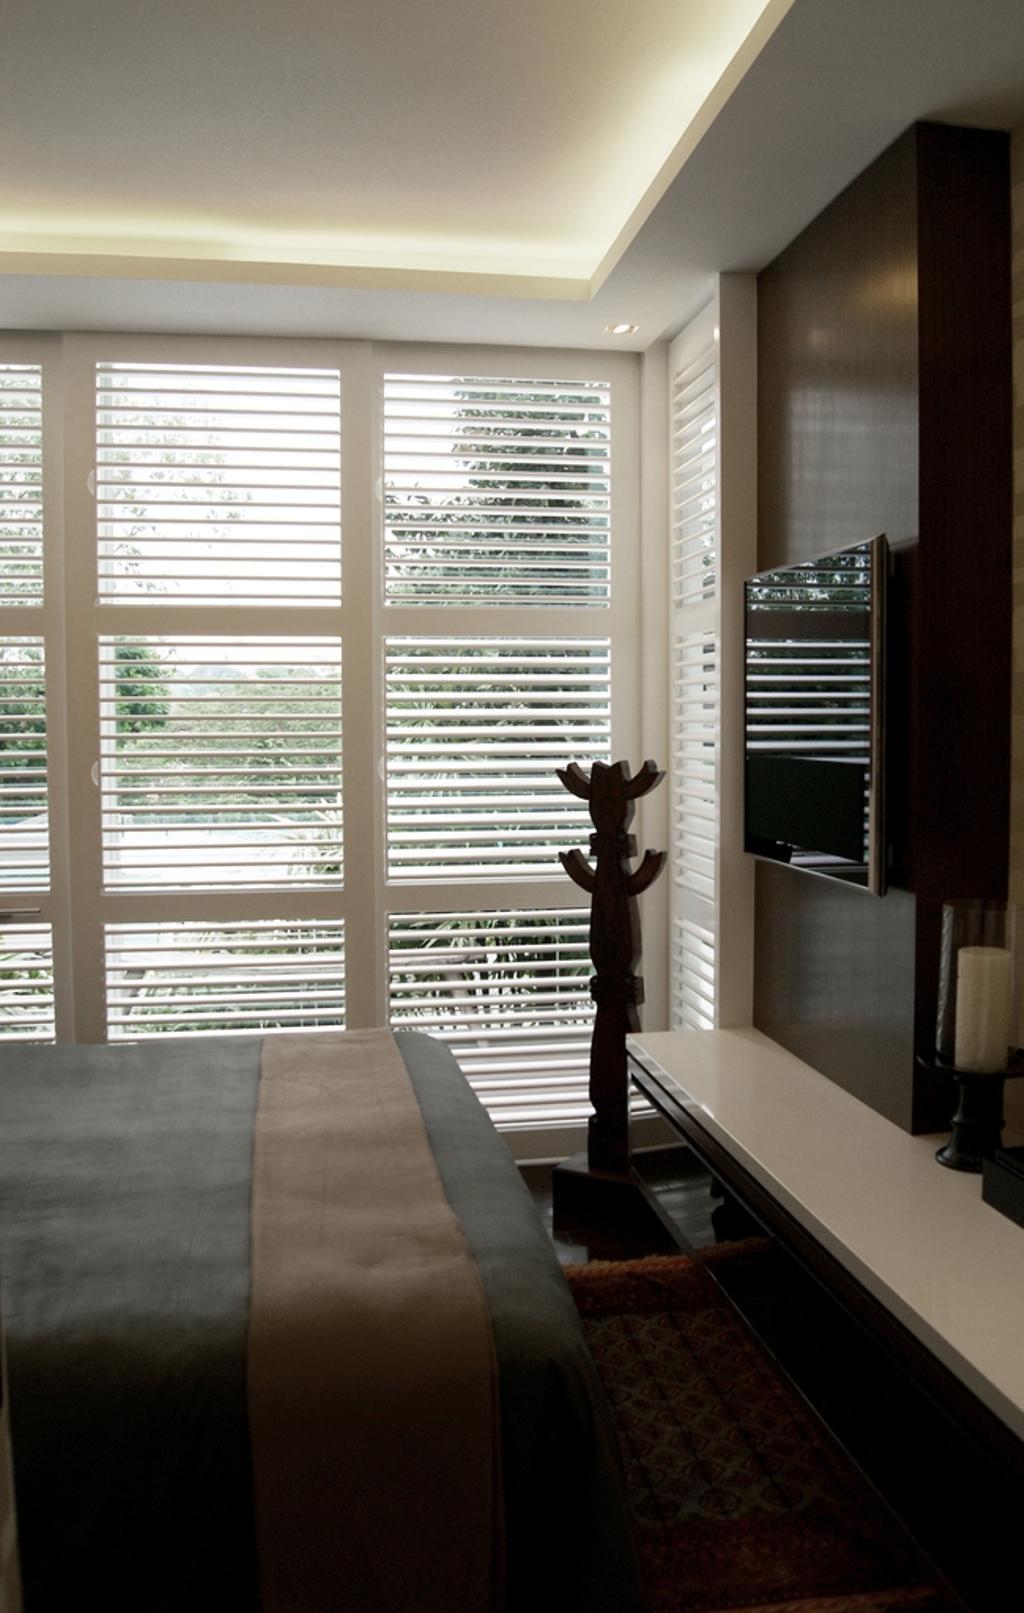 Transitional, Condo, Bedroom, The Levelz, Interior Designer, Metamorph Design, Venetian Blinds, Cove Light, Concealed Lighting, Concealed Light